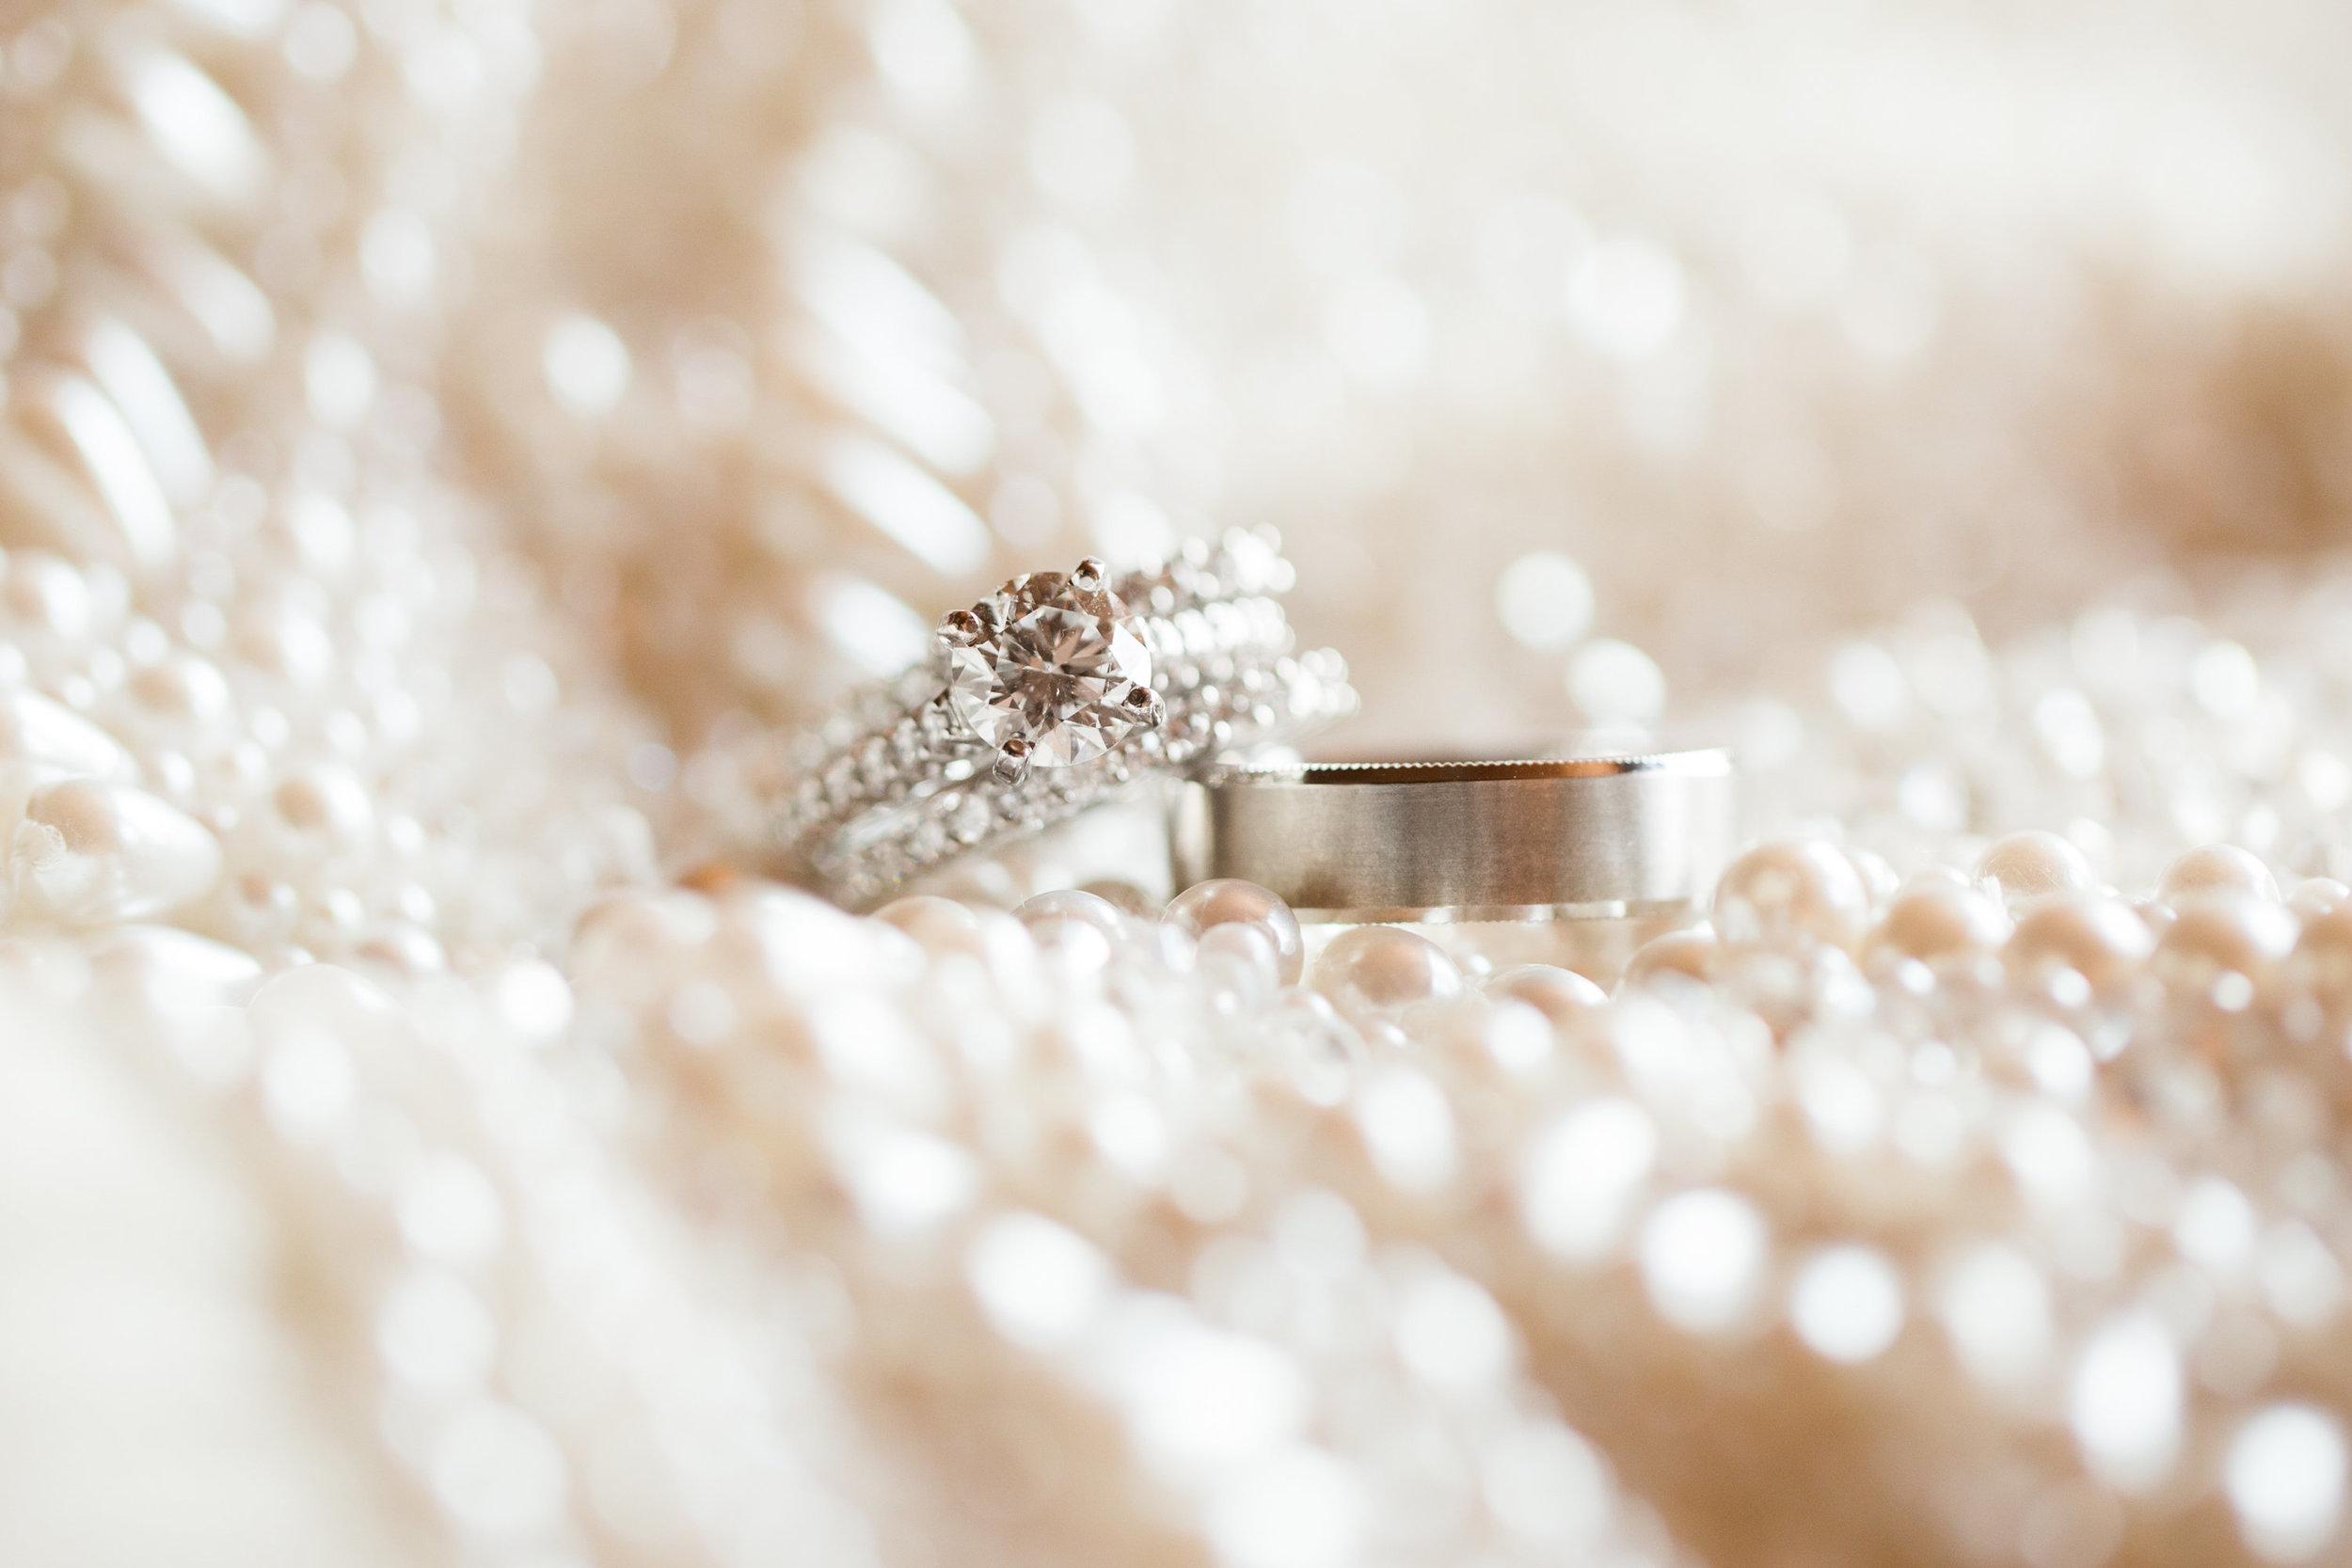 Seattle Wedding Planner, Wedding Wise | Ciccarelli Photography | Edgewater Hotel Wedding | Engagement ring